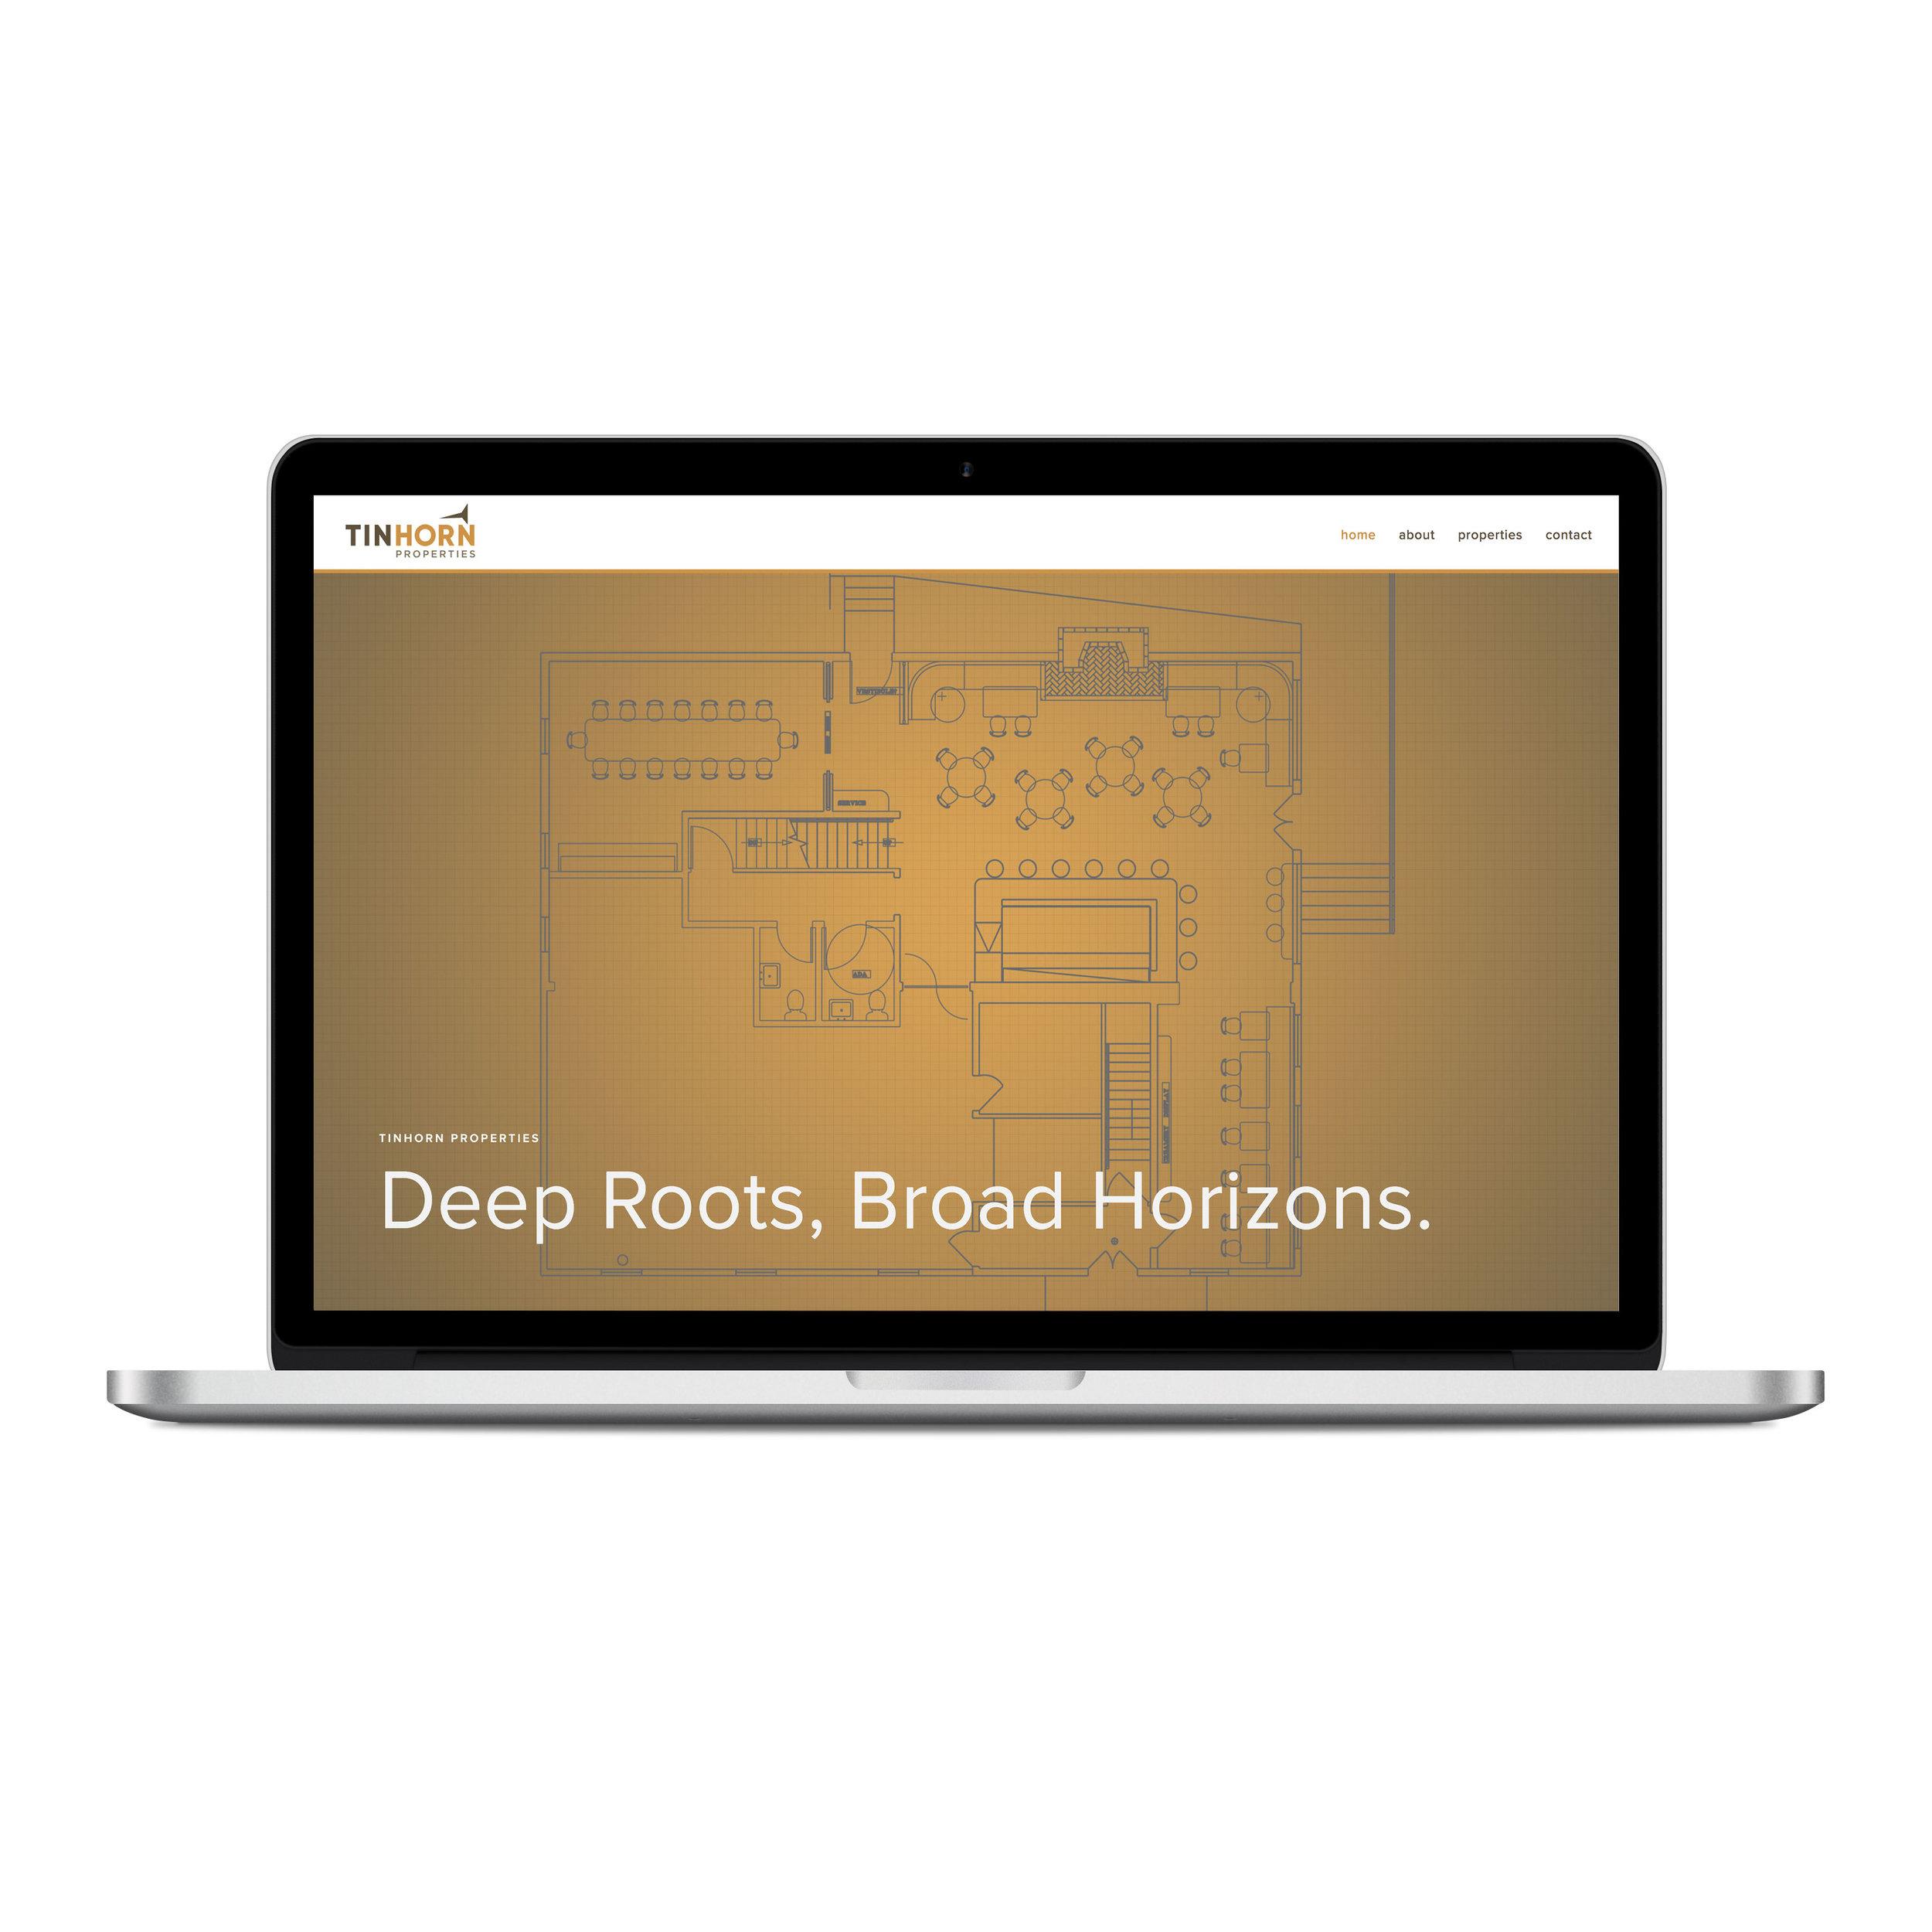 Tinhorn_MacBook-Pro_Mockup.jpg